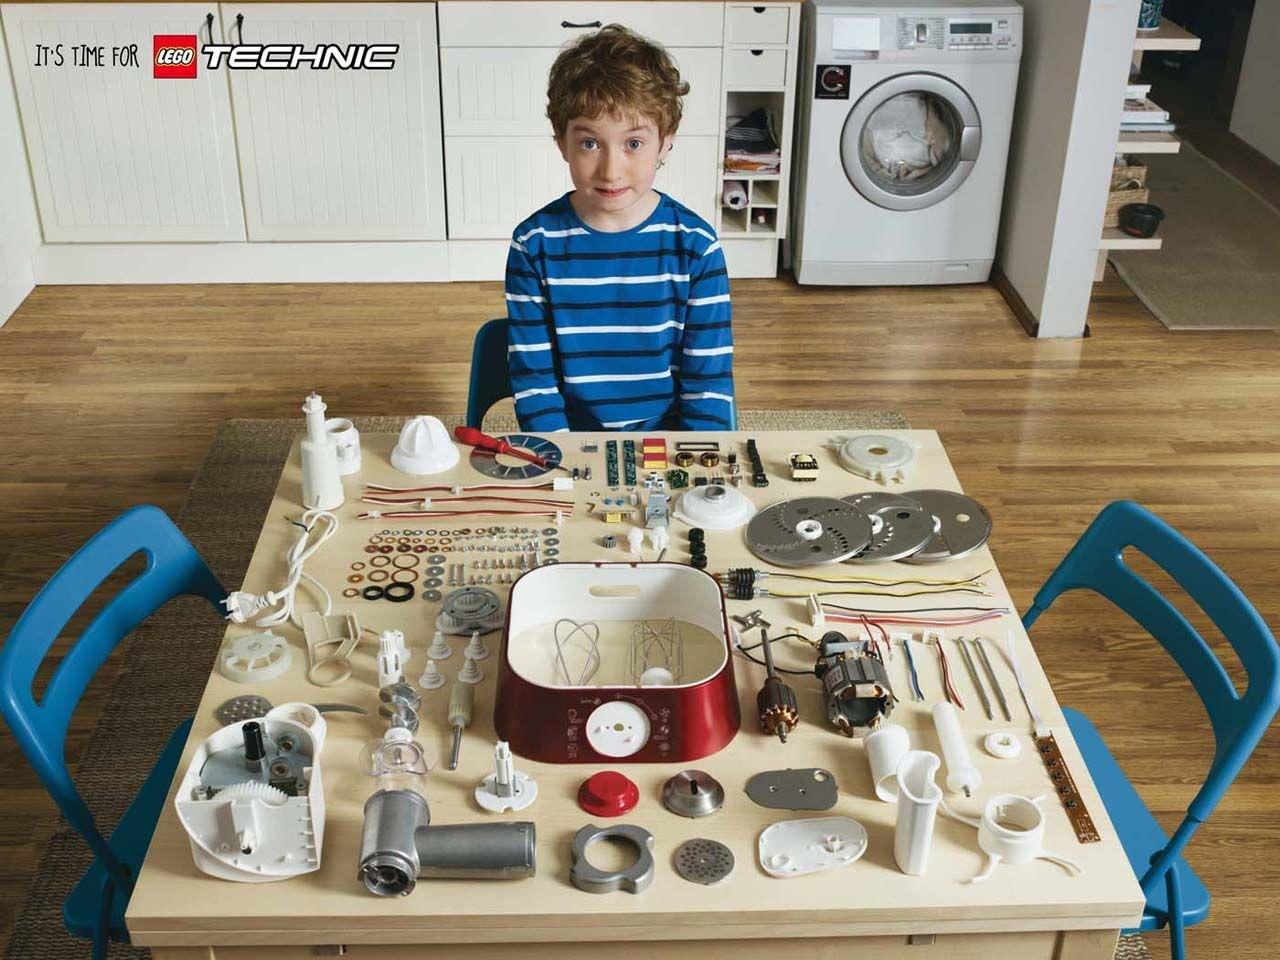 lego_technic_toaster_aotw.jpg